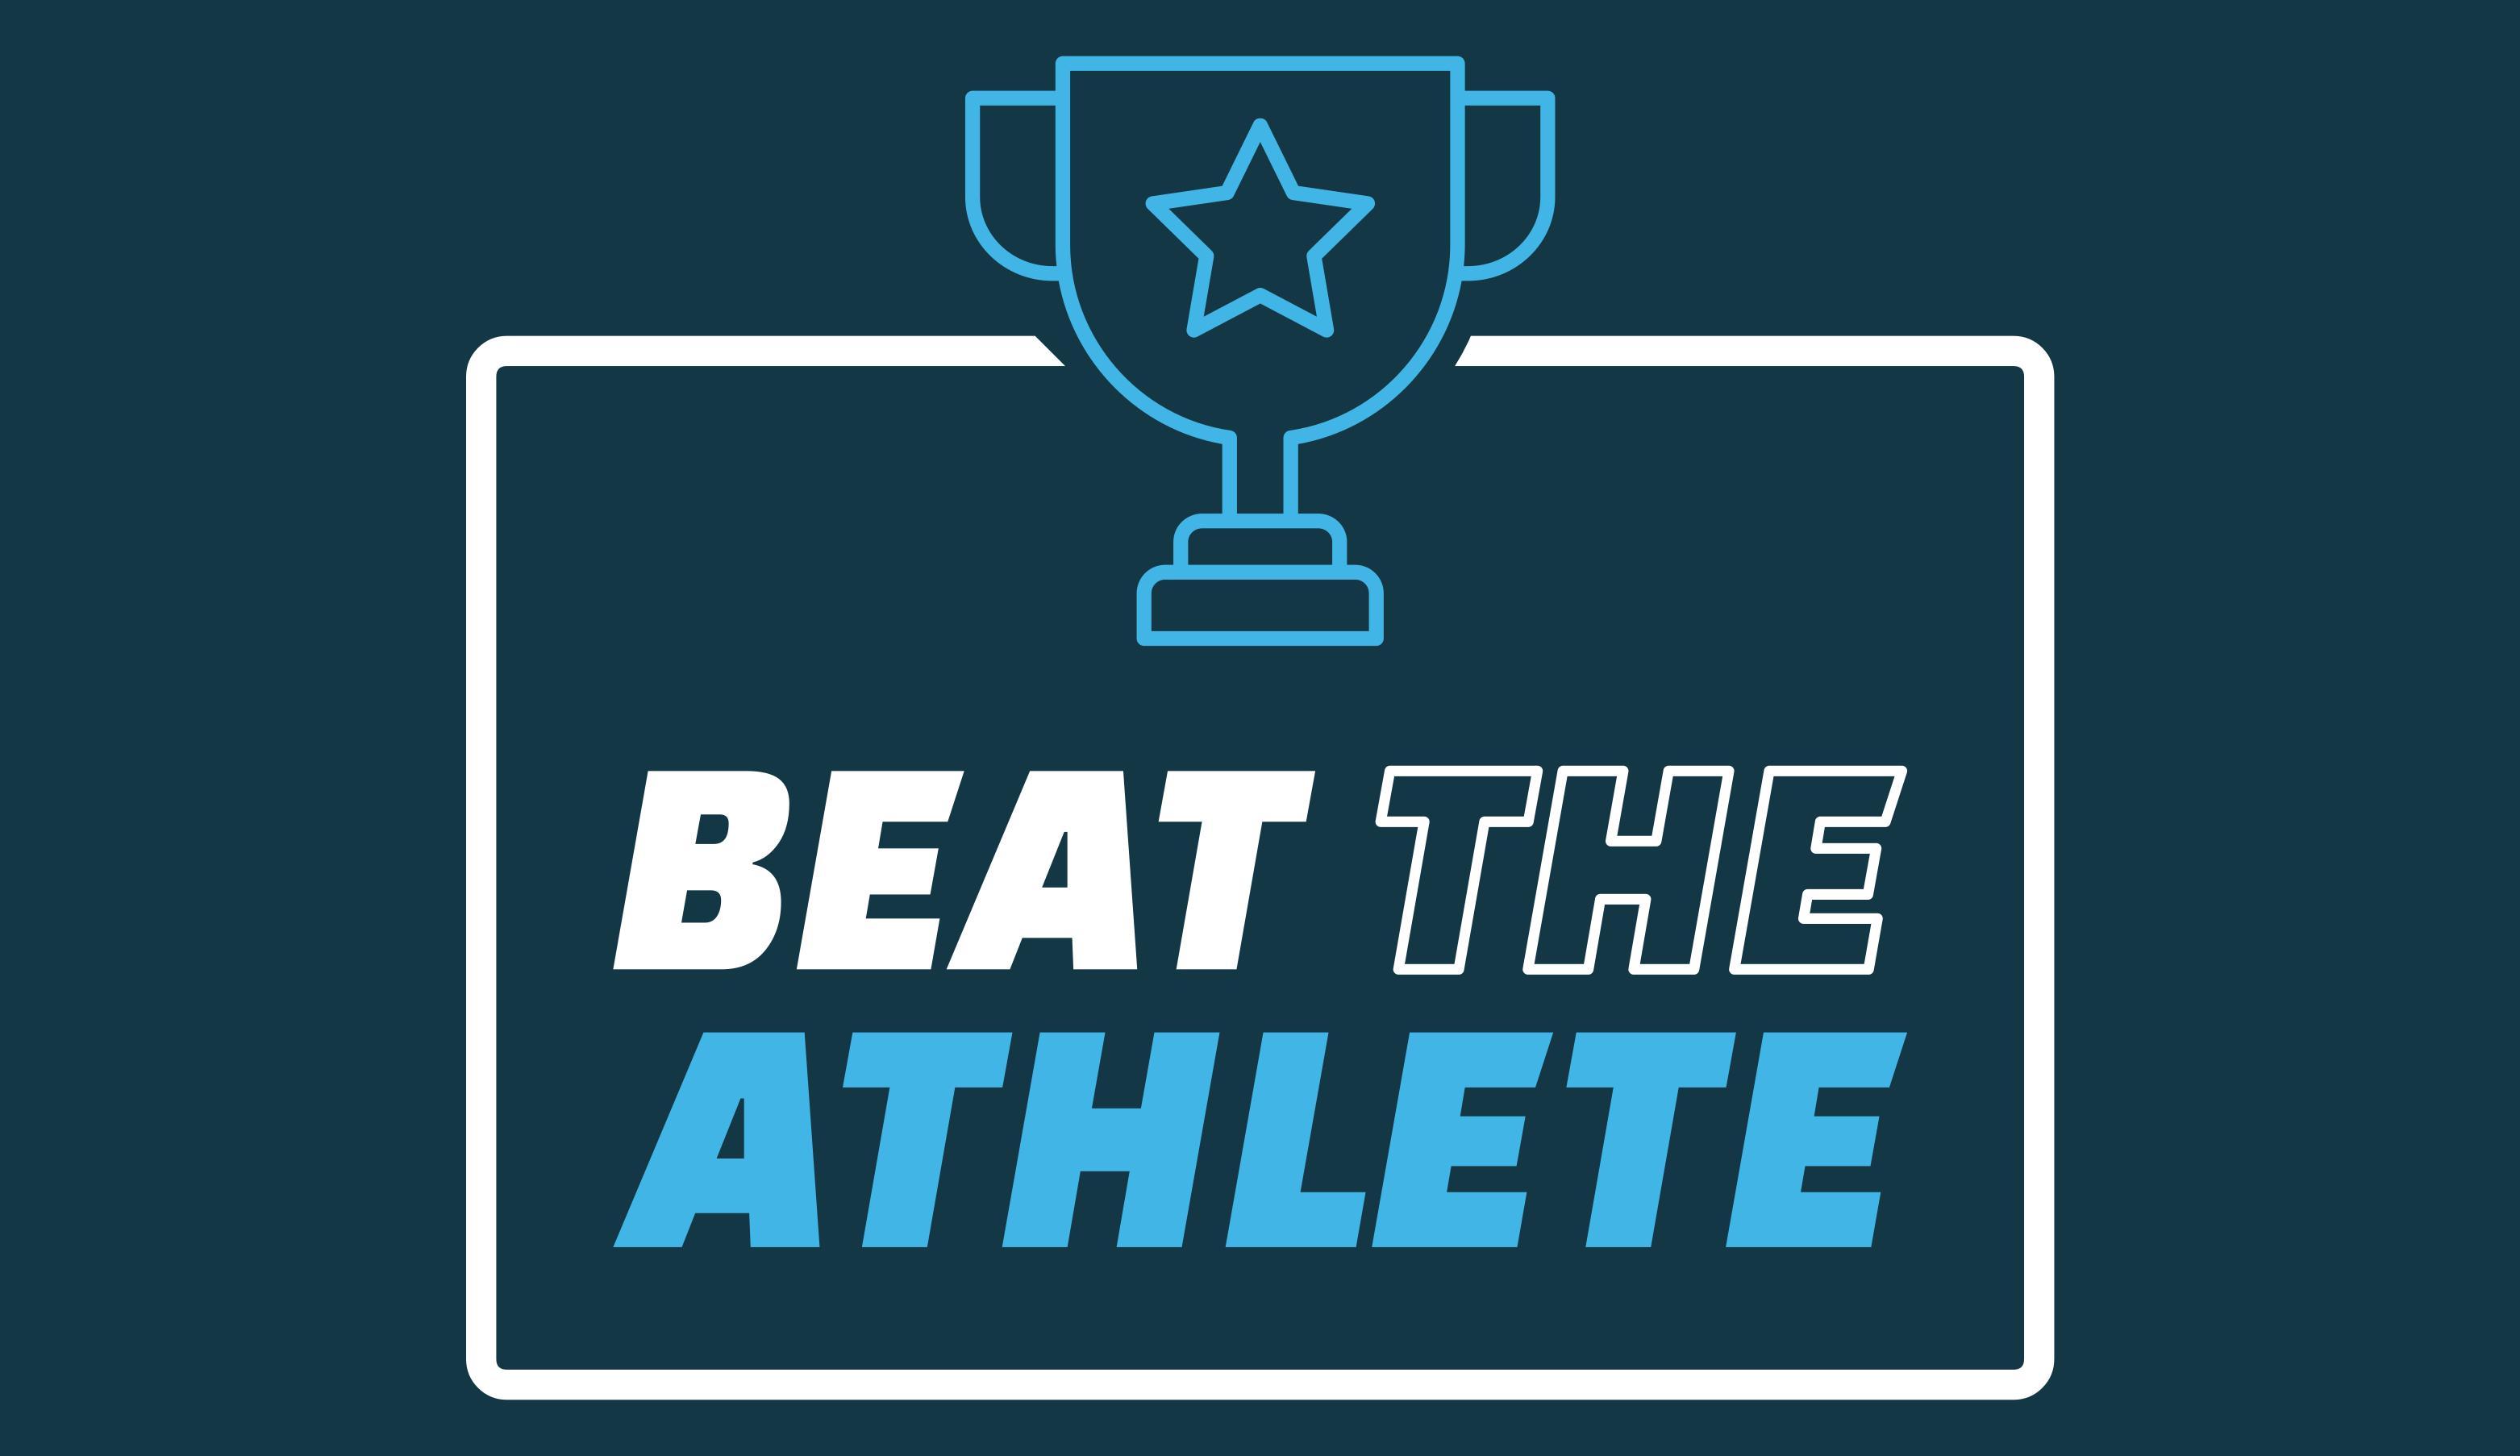 Beat the Athlete